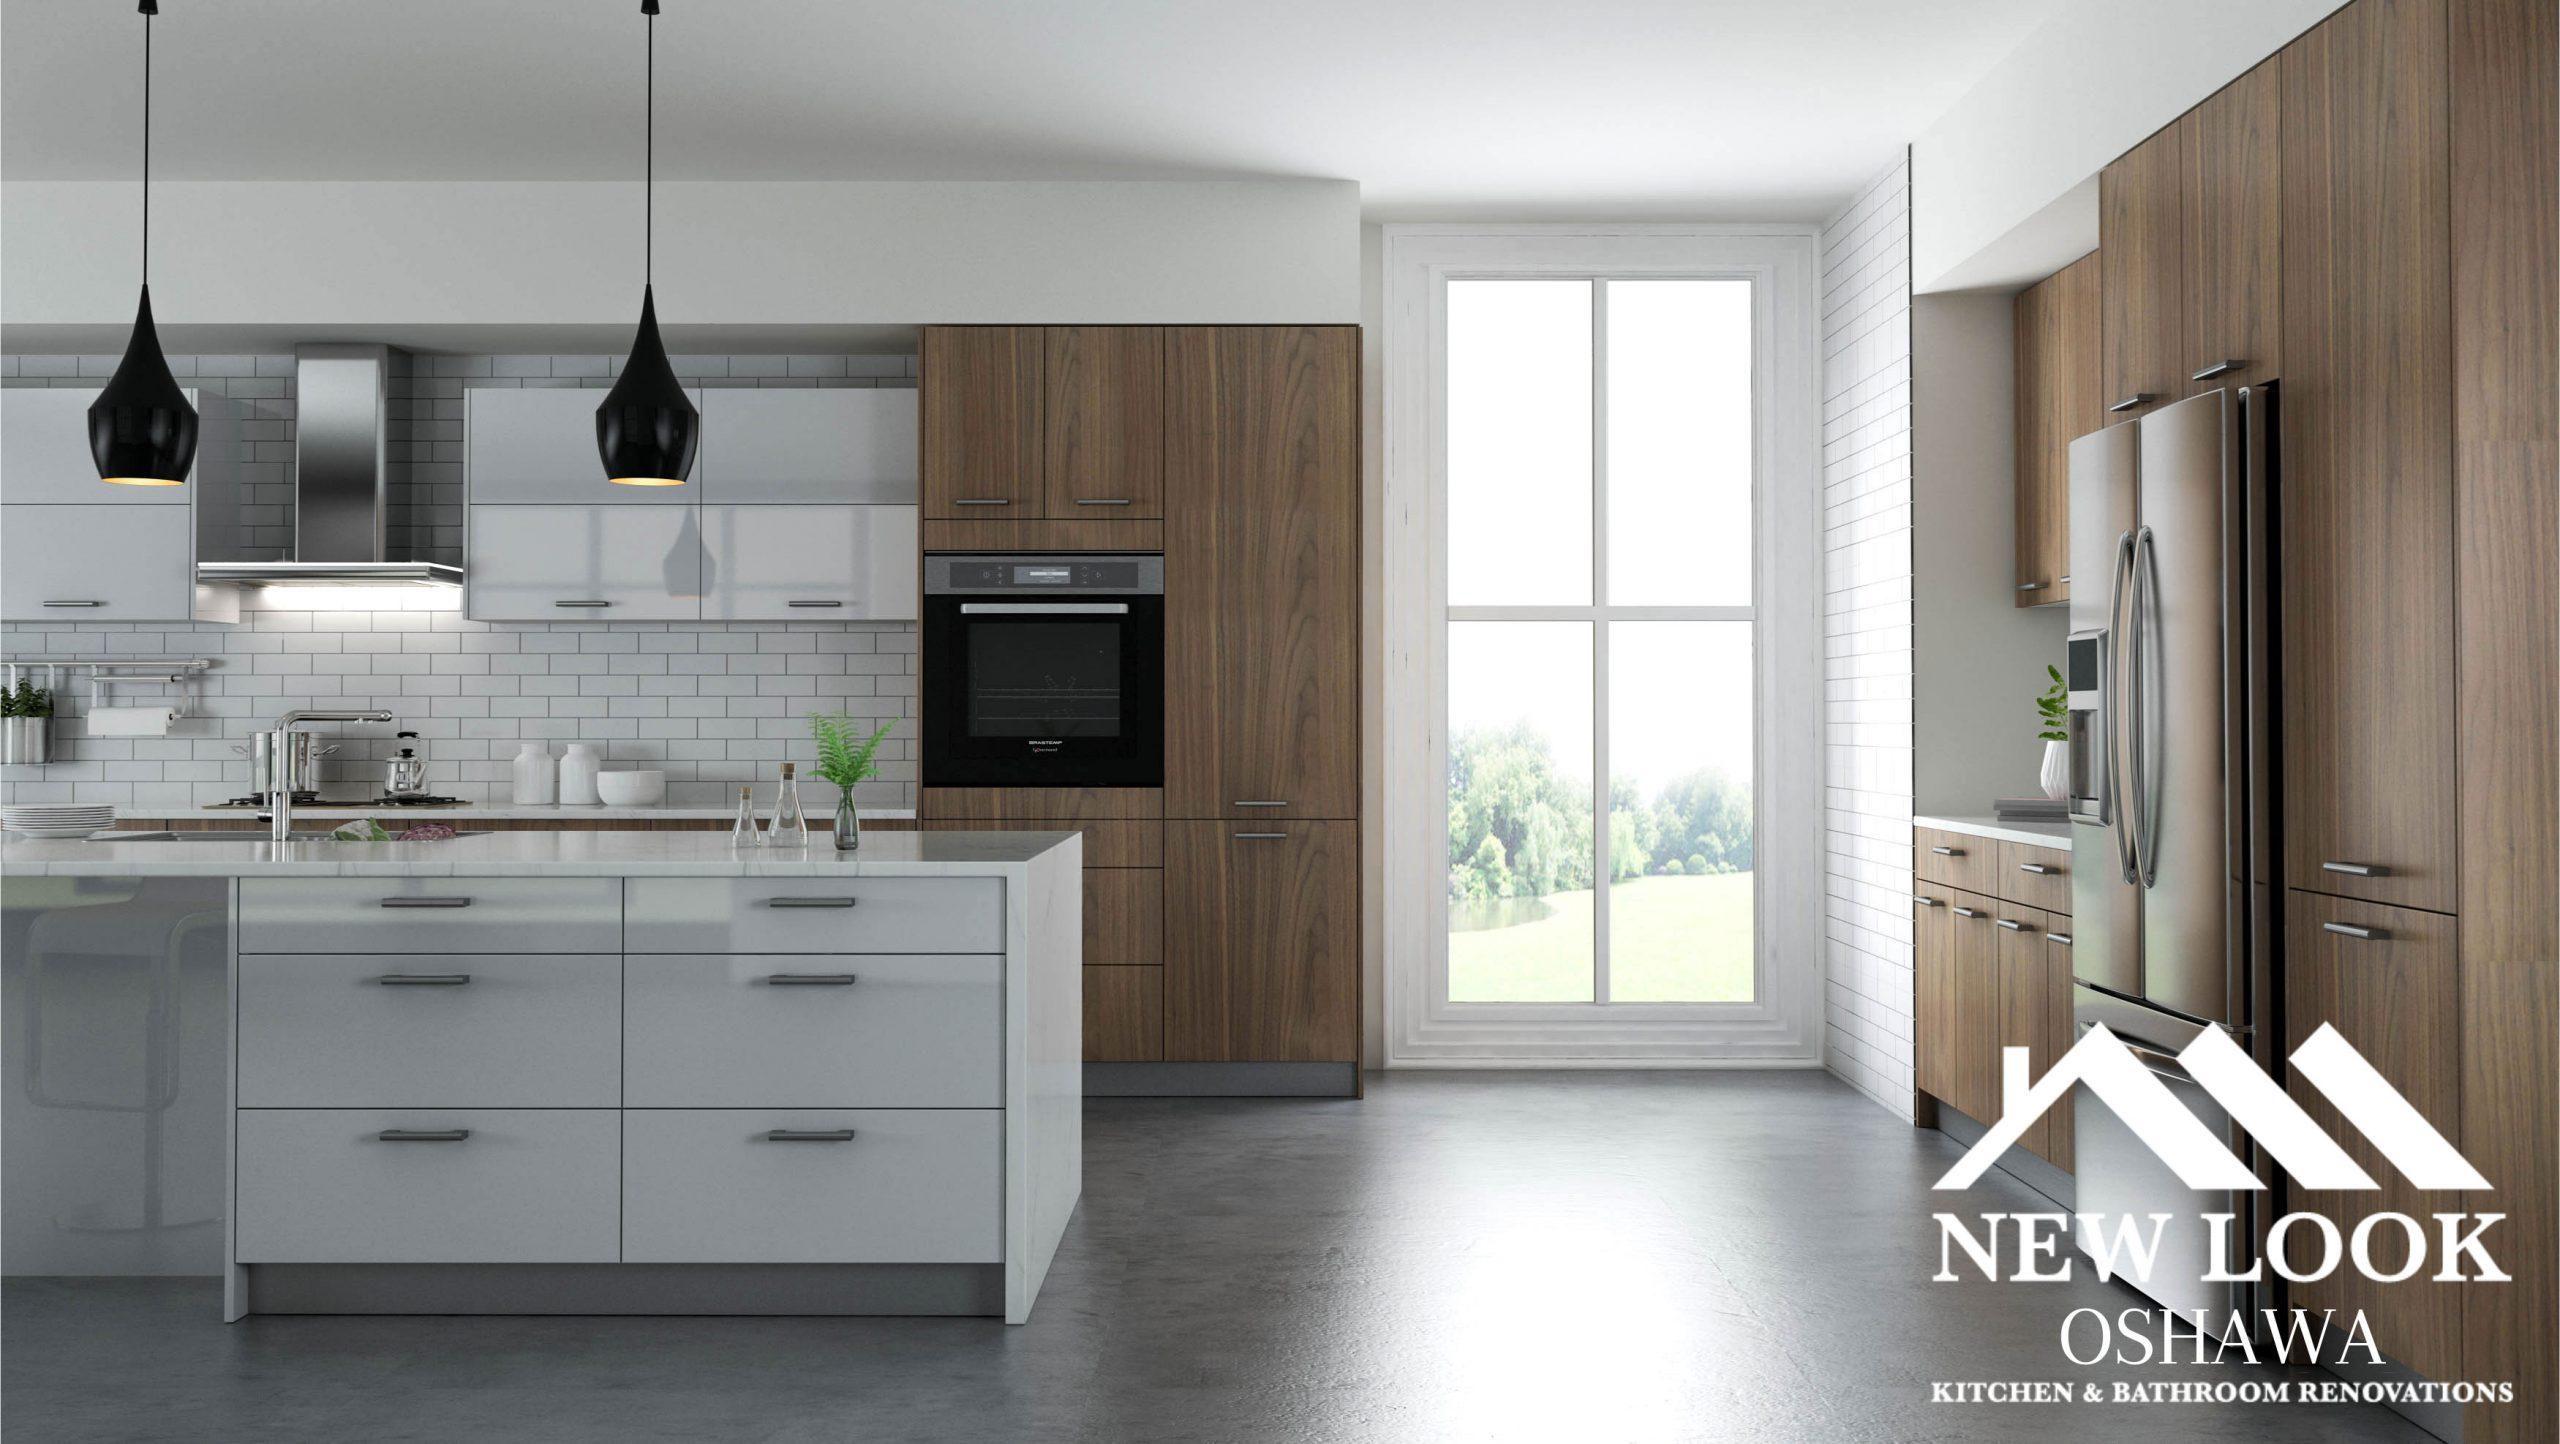 rustic oak golden home new look oshawa kitchen & bathroom renovation